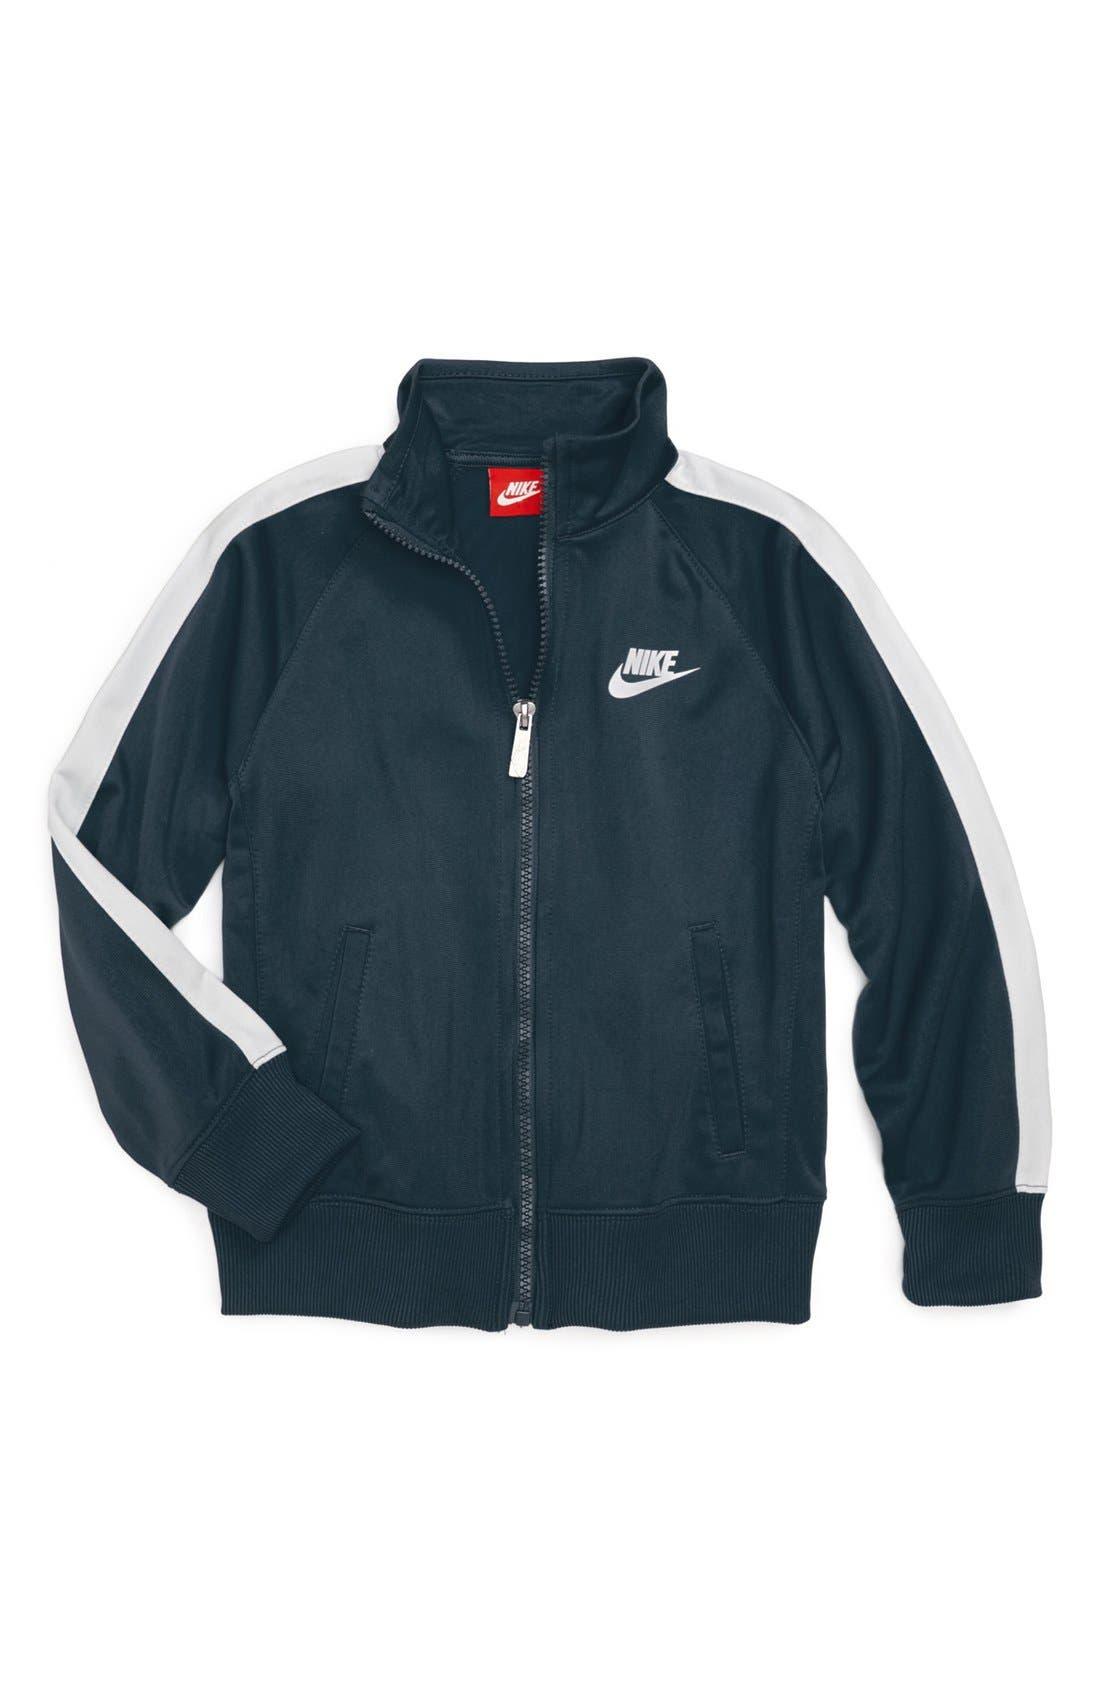 Main Image - Nike 'Futura' Jacket (Little Boys)